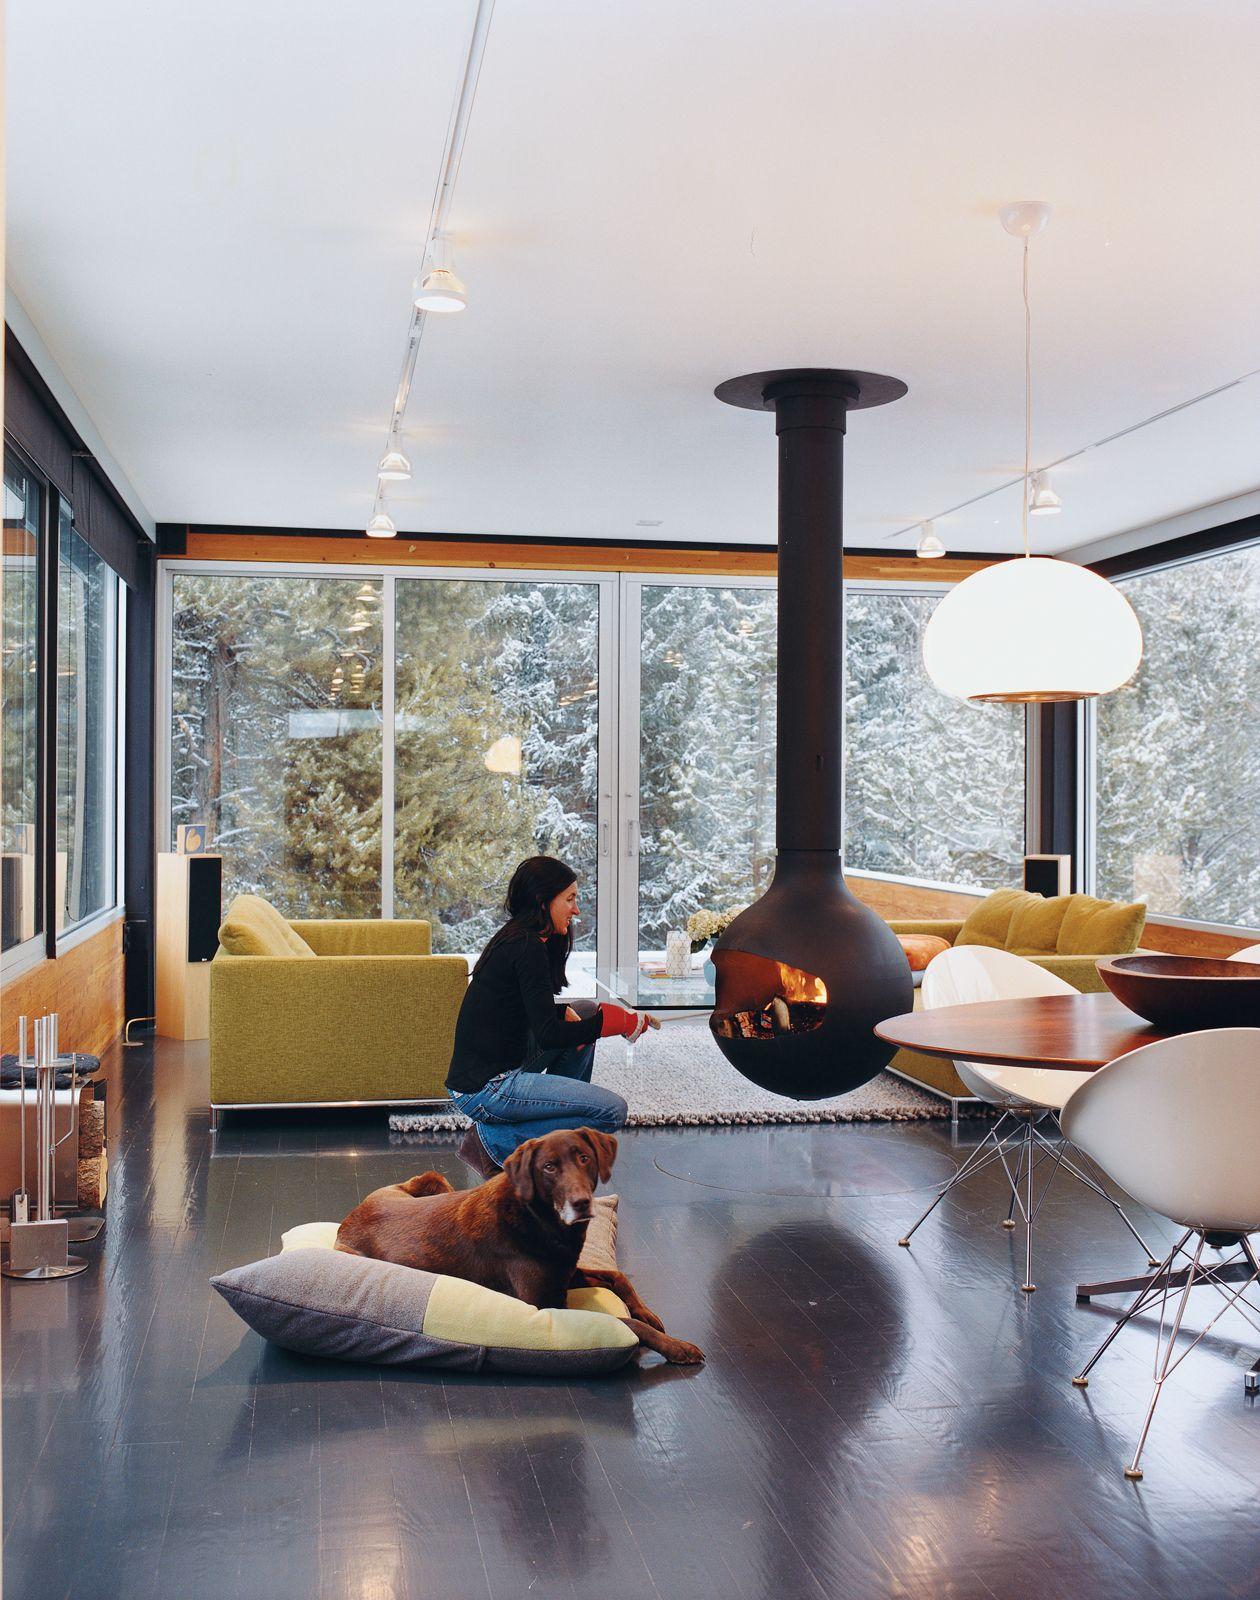 cheminee bathyscafocus foyer suspendu ouvert pivotant. Black Bedroom Furniture Sets. Home Design Ideas